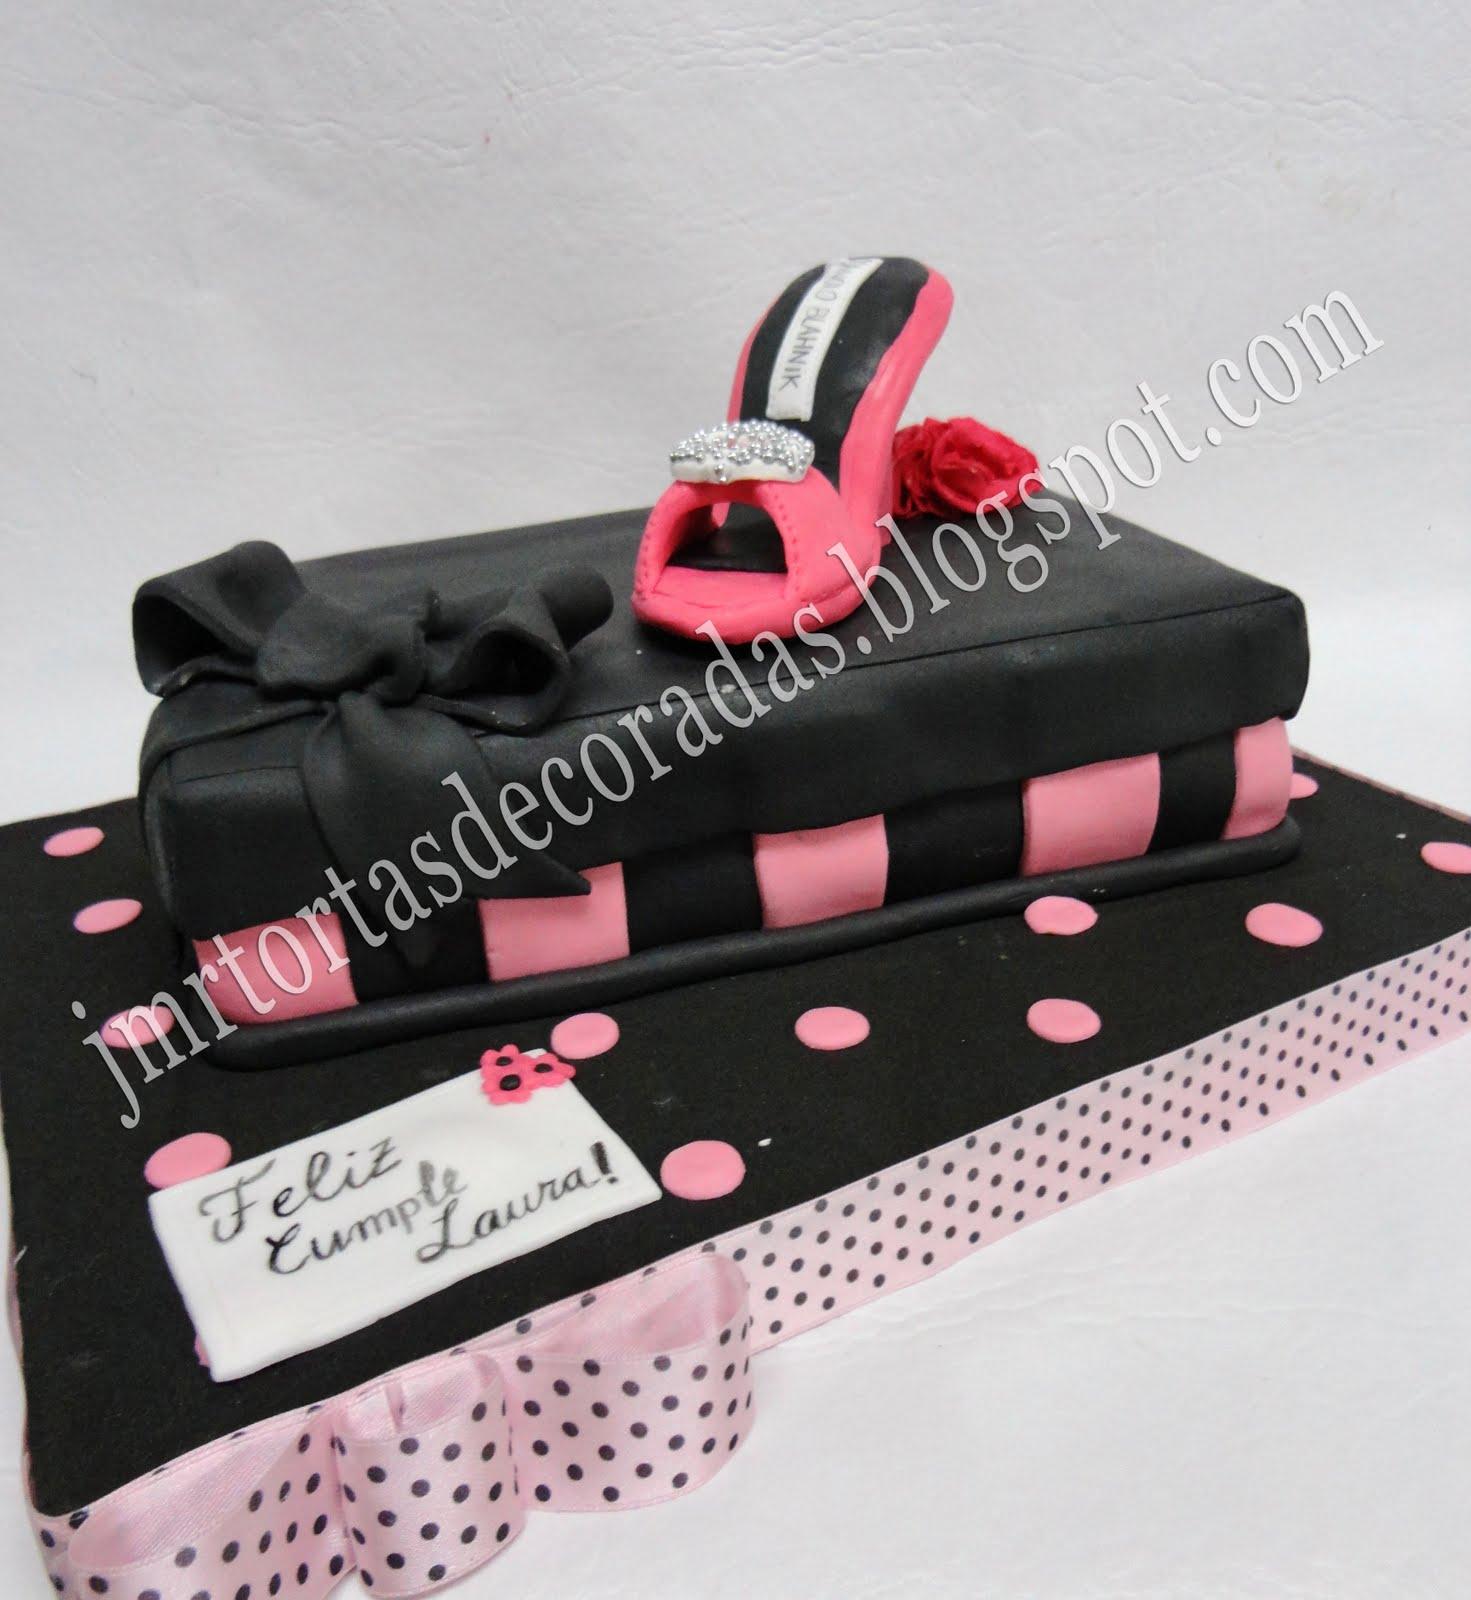 Torta caja de zapatos jmr tortas decoradas - Cajas de zapatos decoradas ...